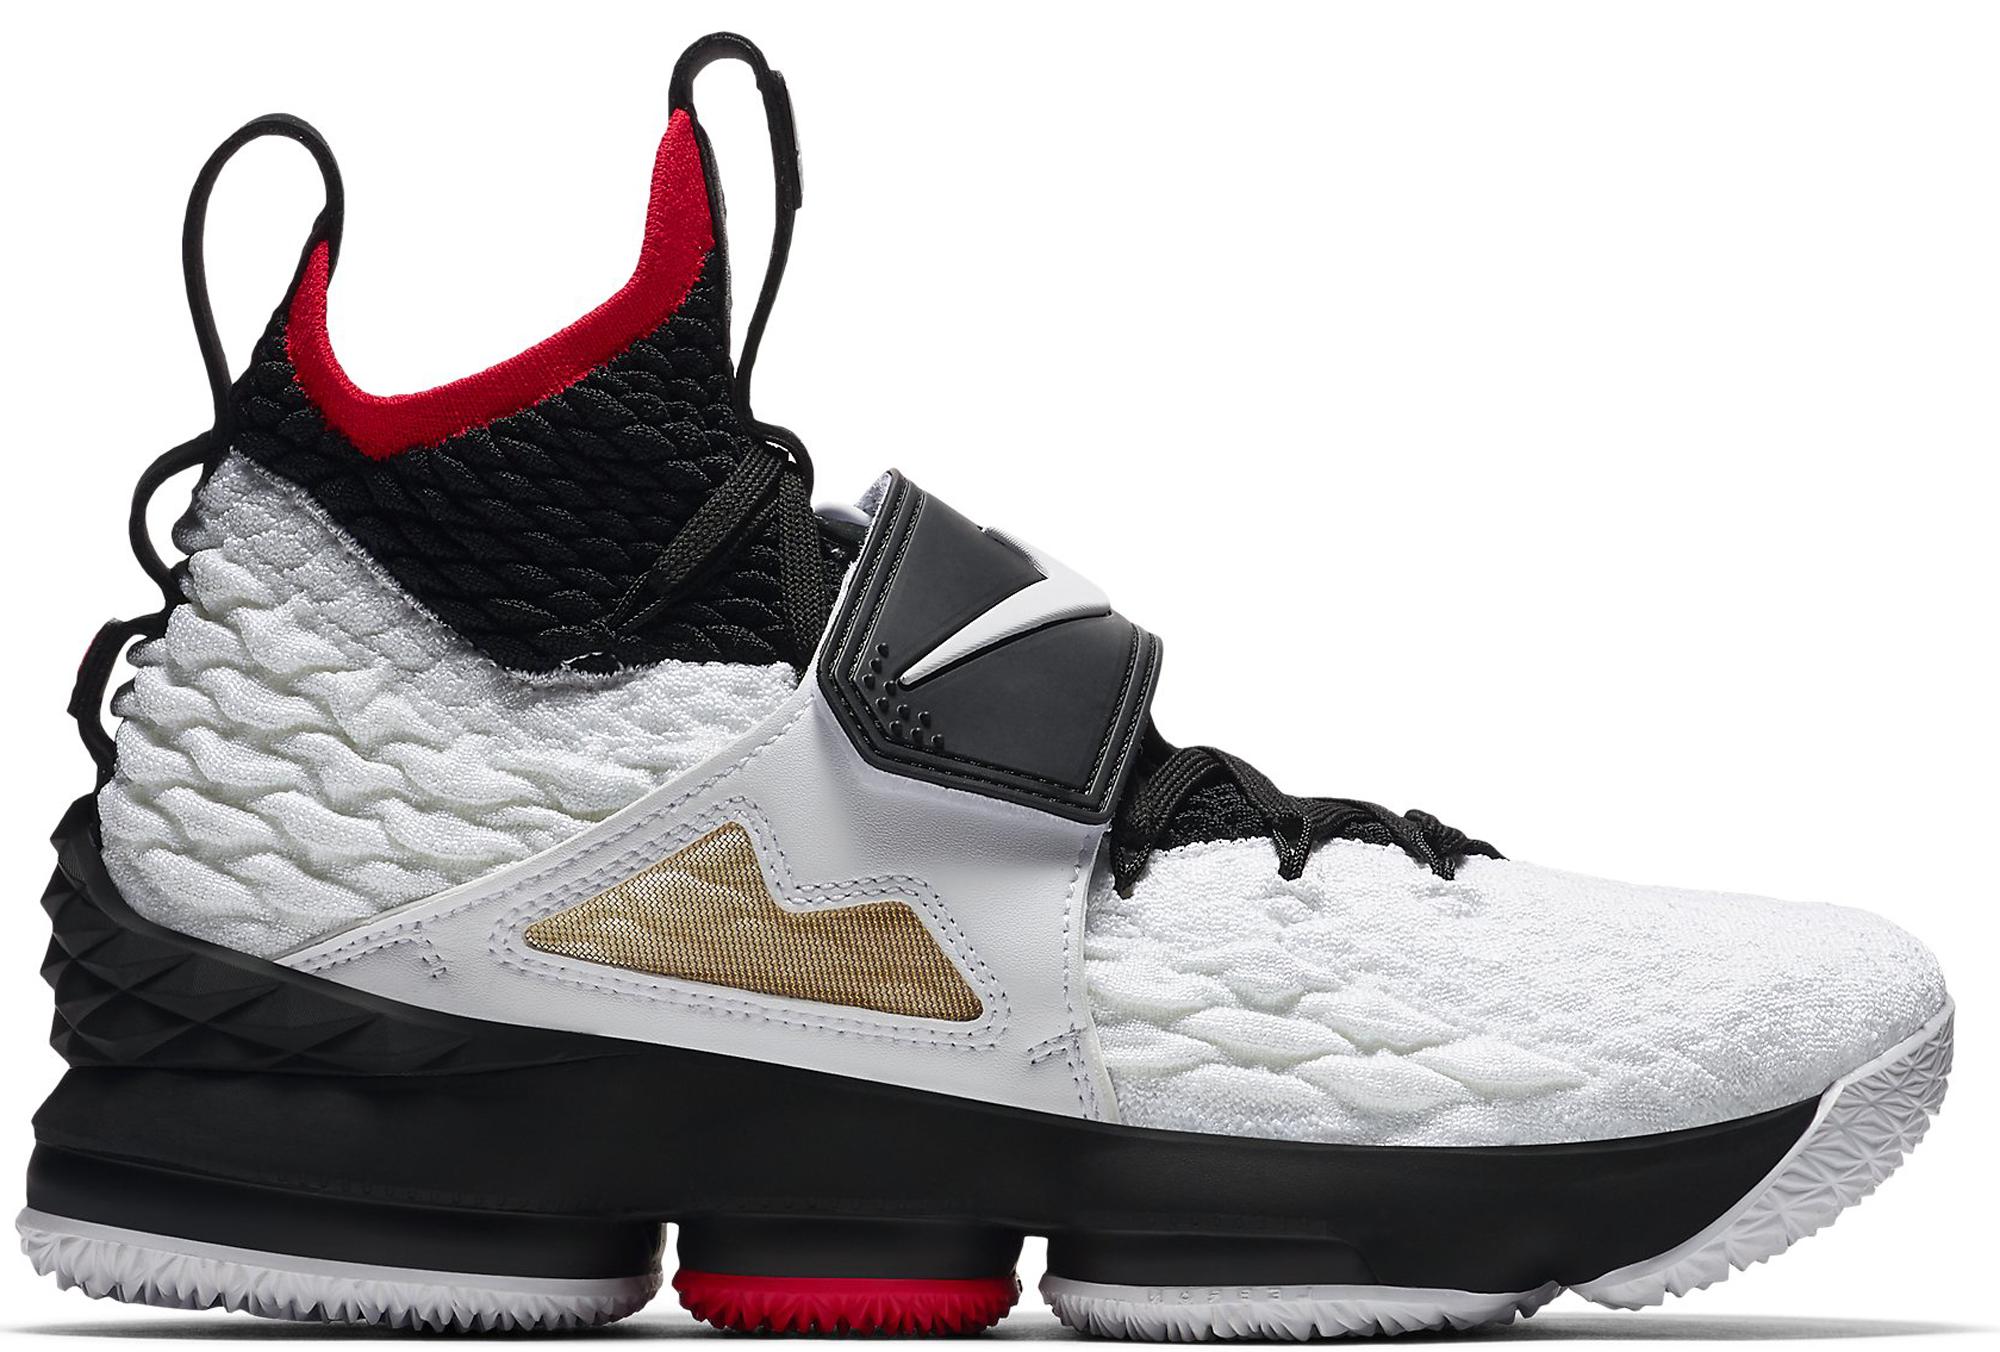 Nike LeBron 15 Diamond Turf